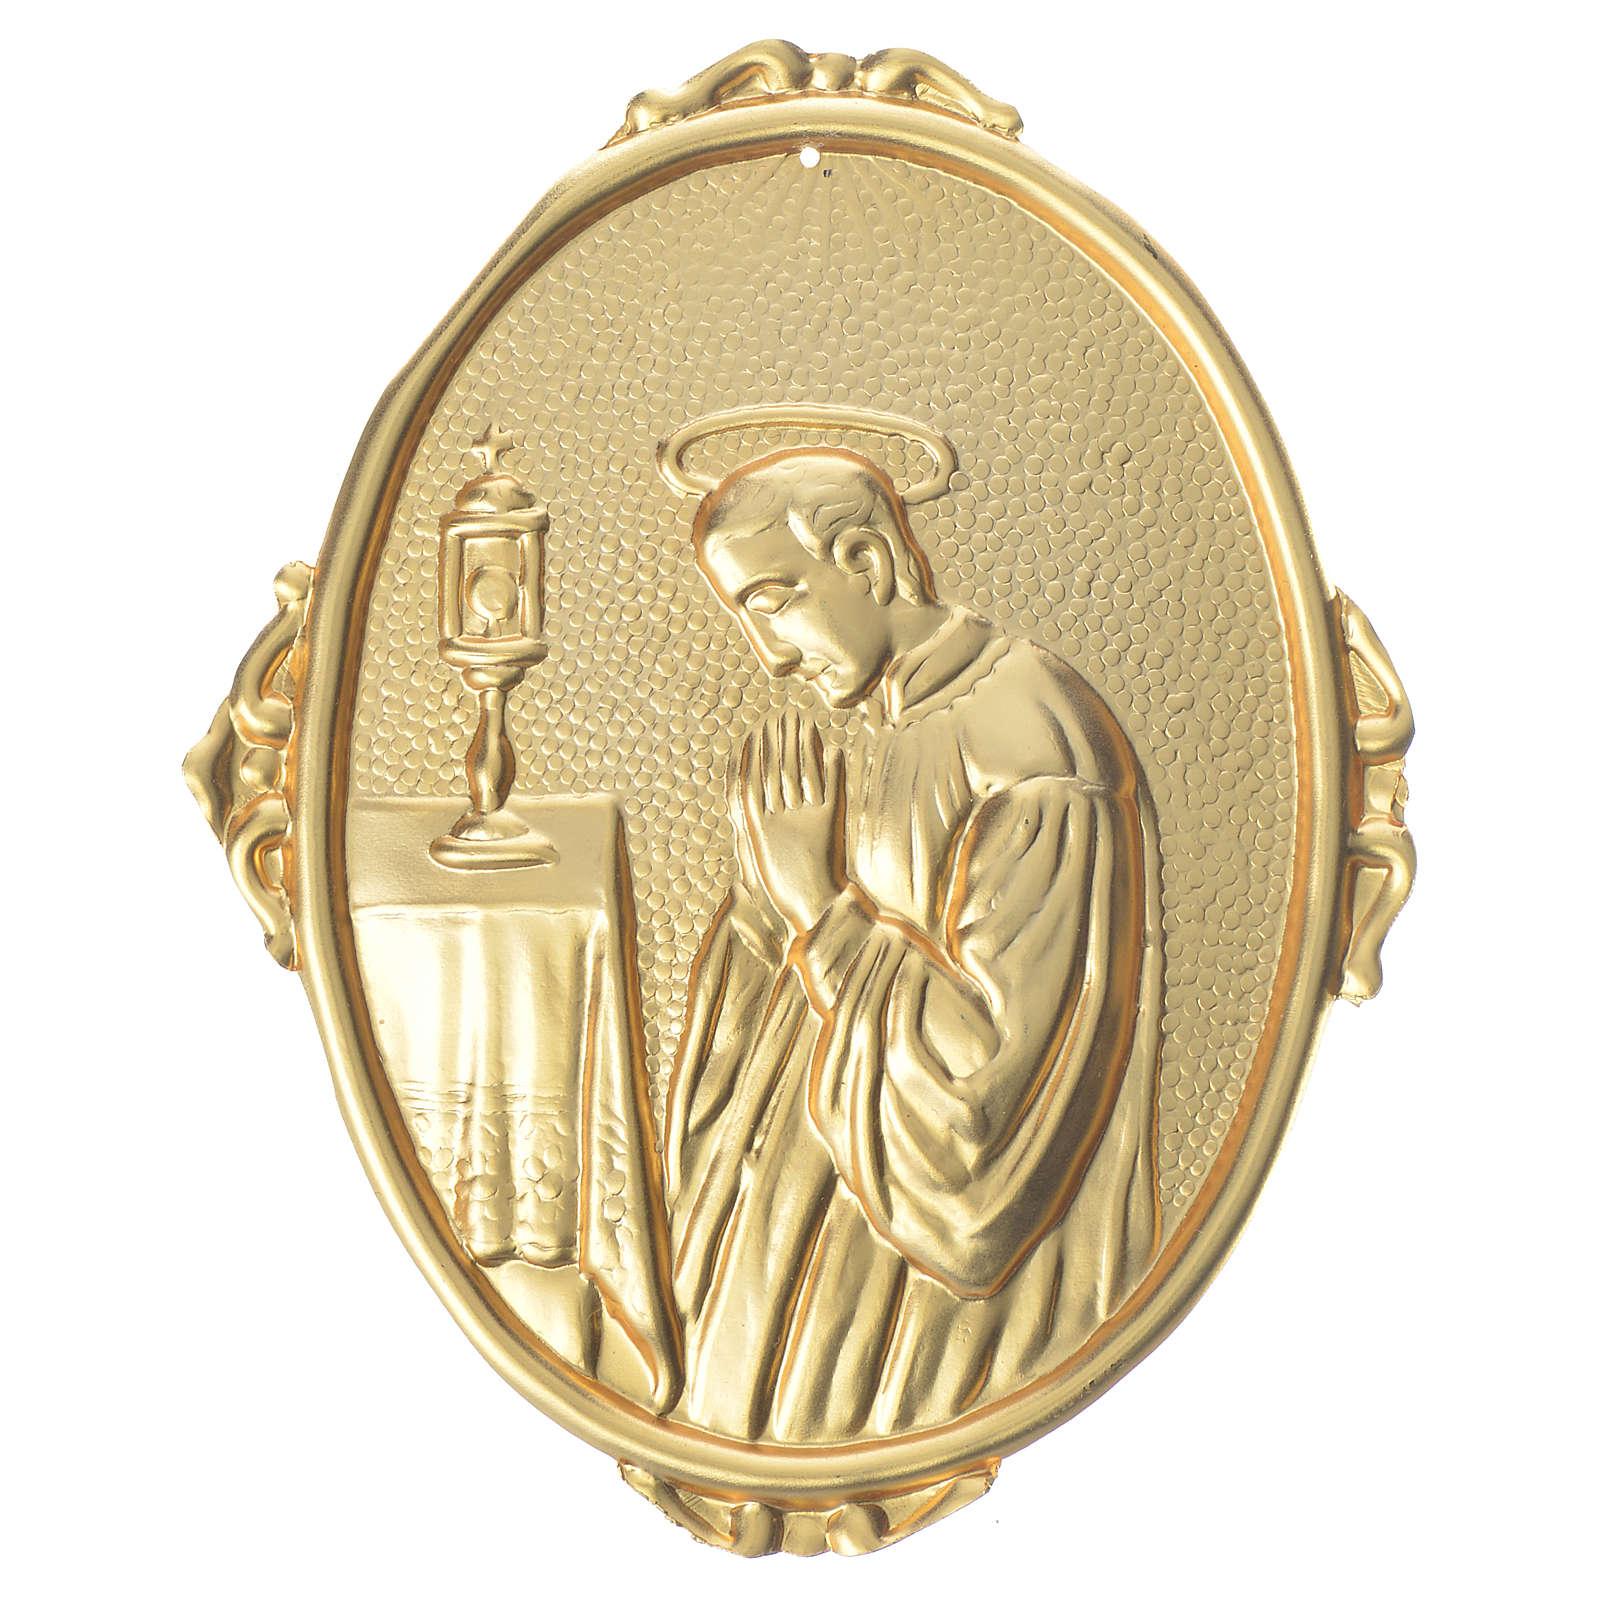 Confraternity Medal in brass, Saint Luigi 3